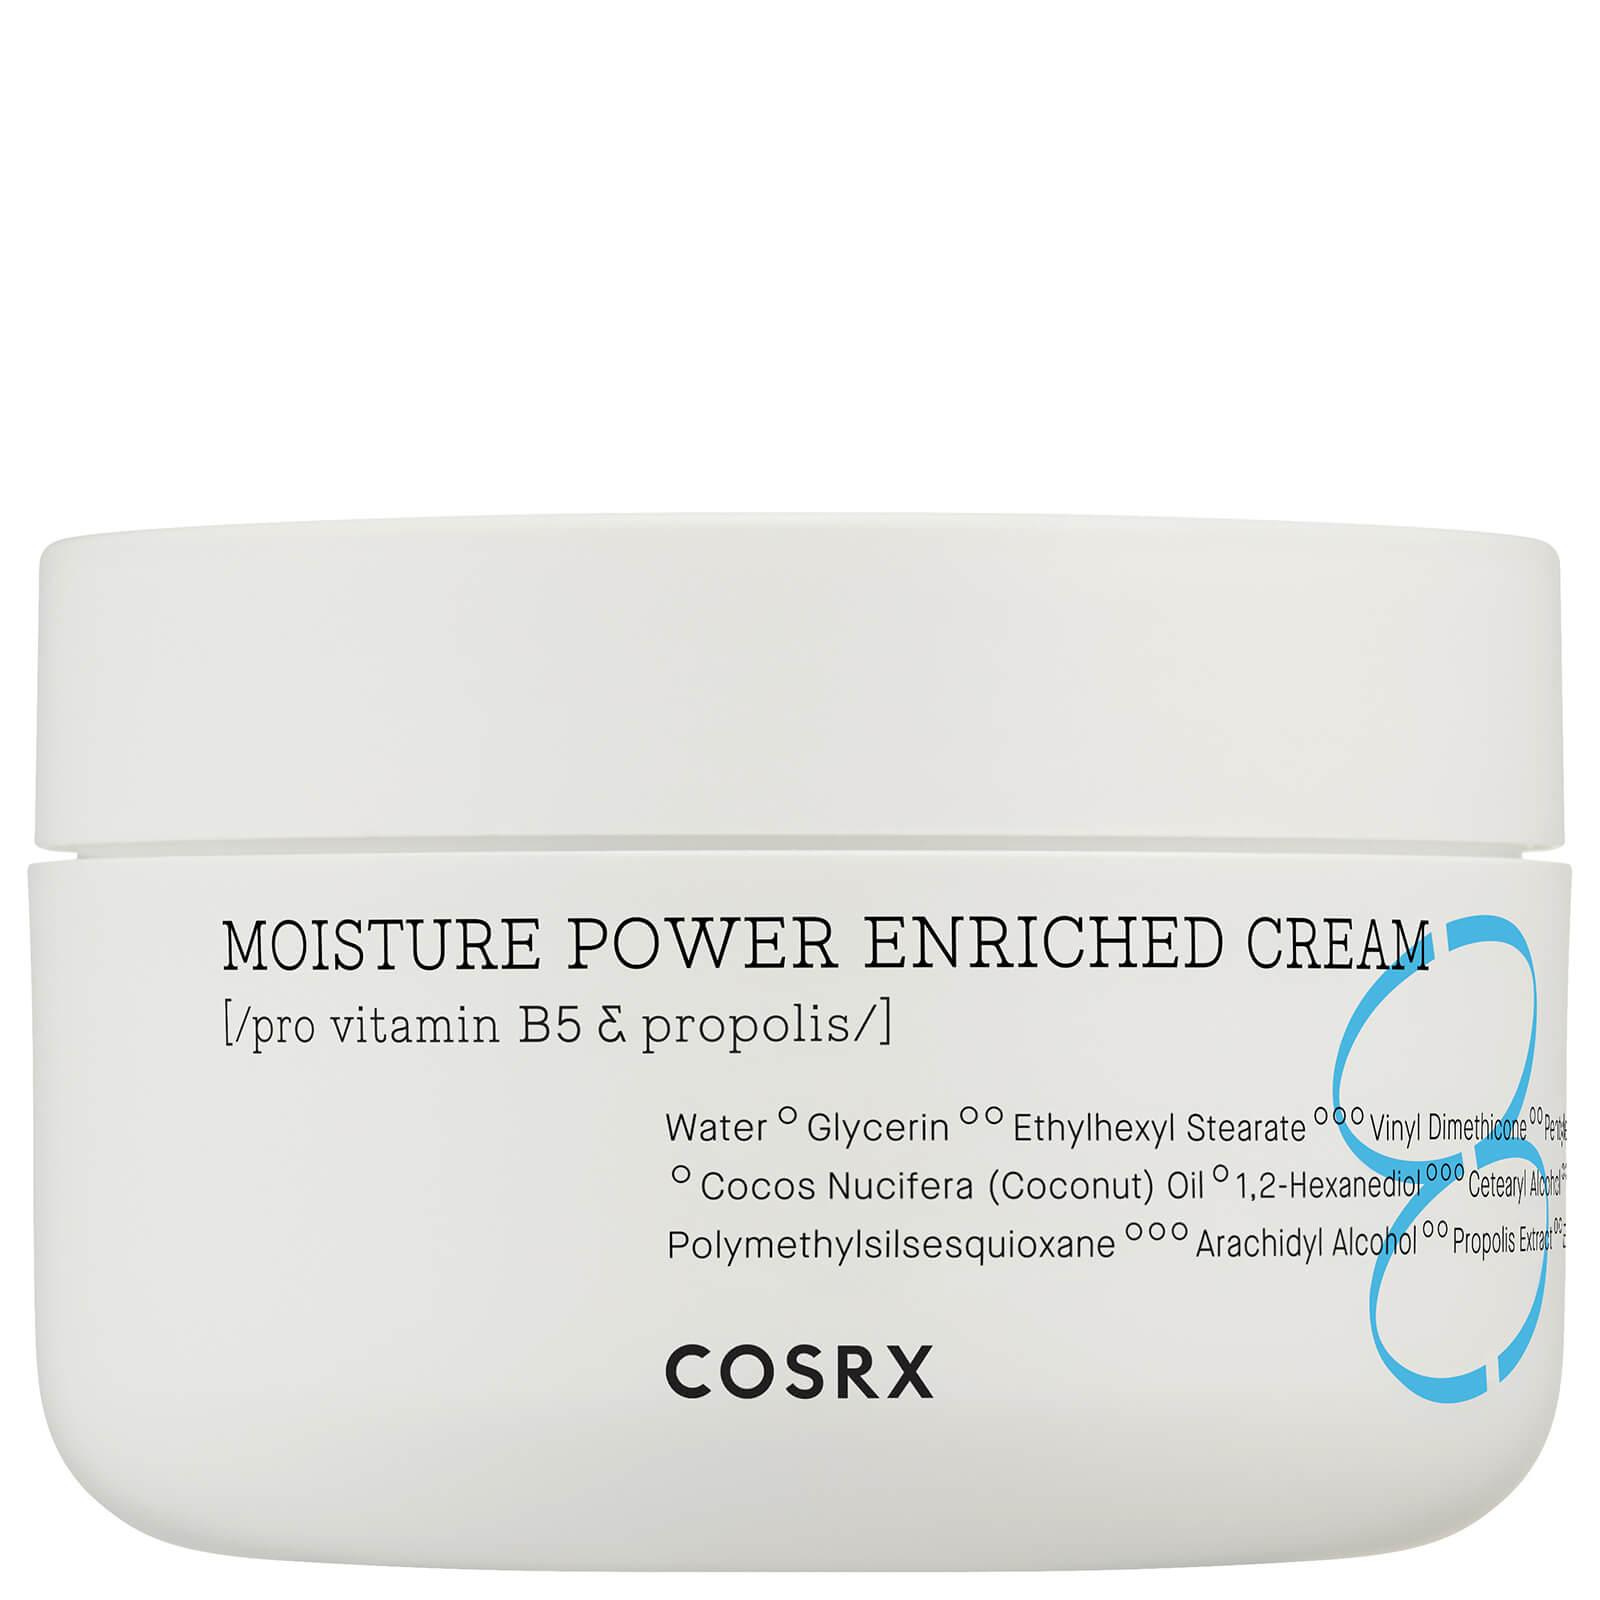 Купить COSRX Moisture Power Enriched Cream 50ml